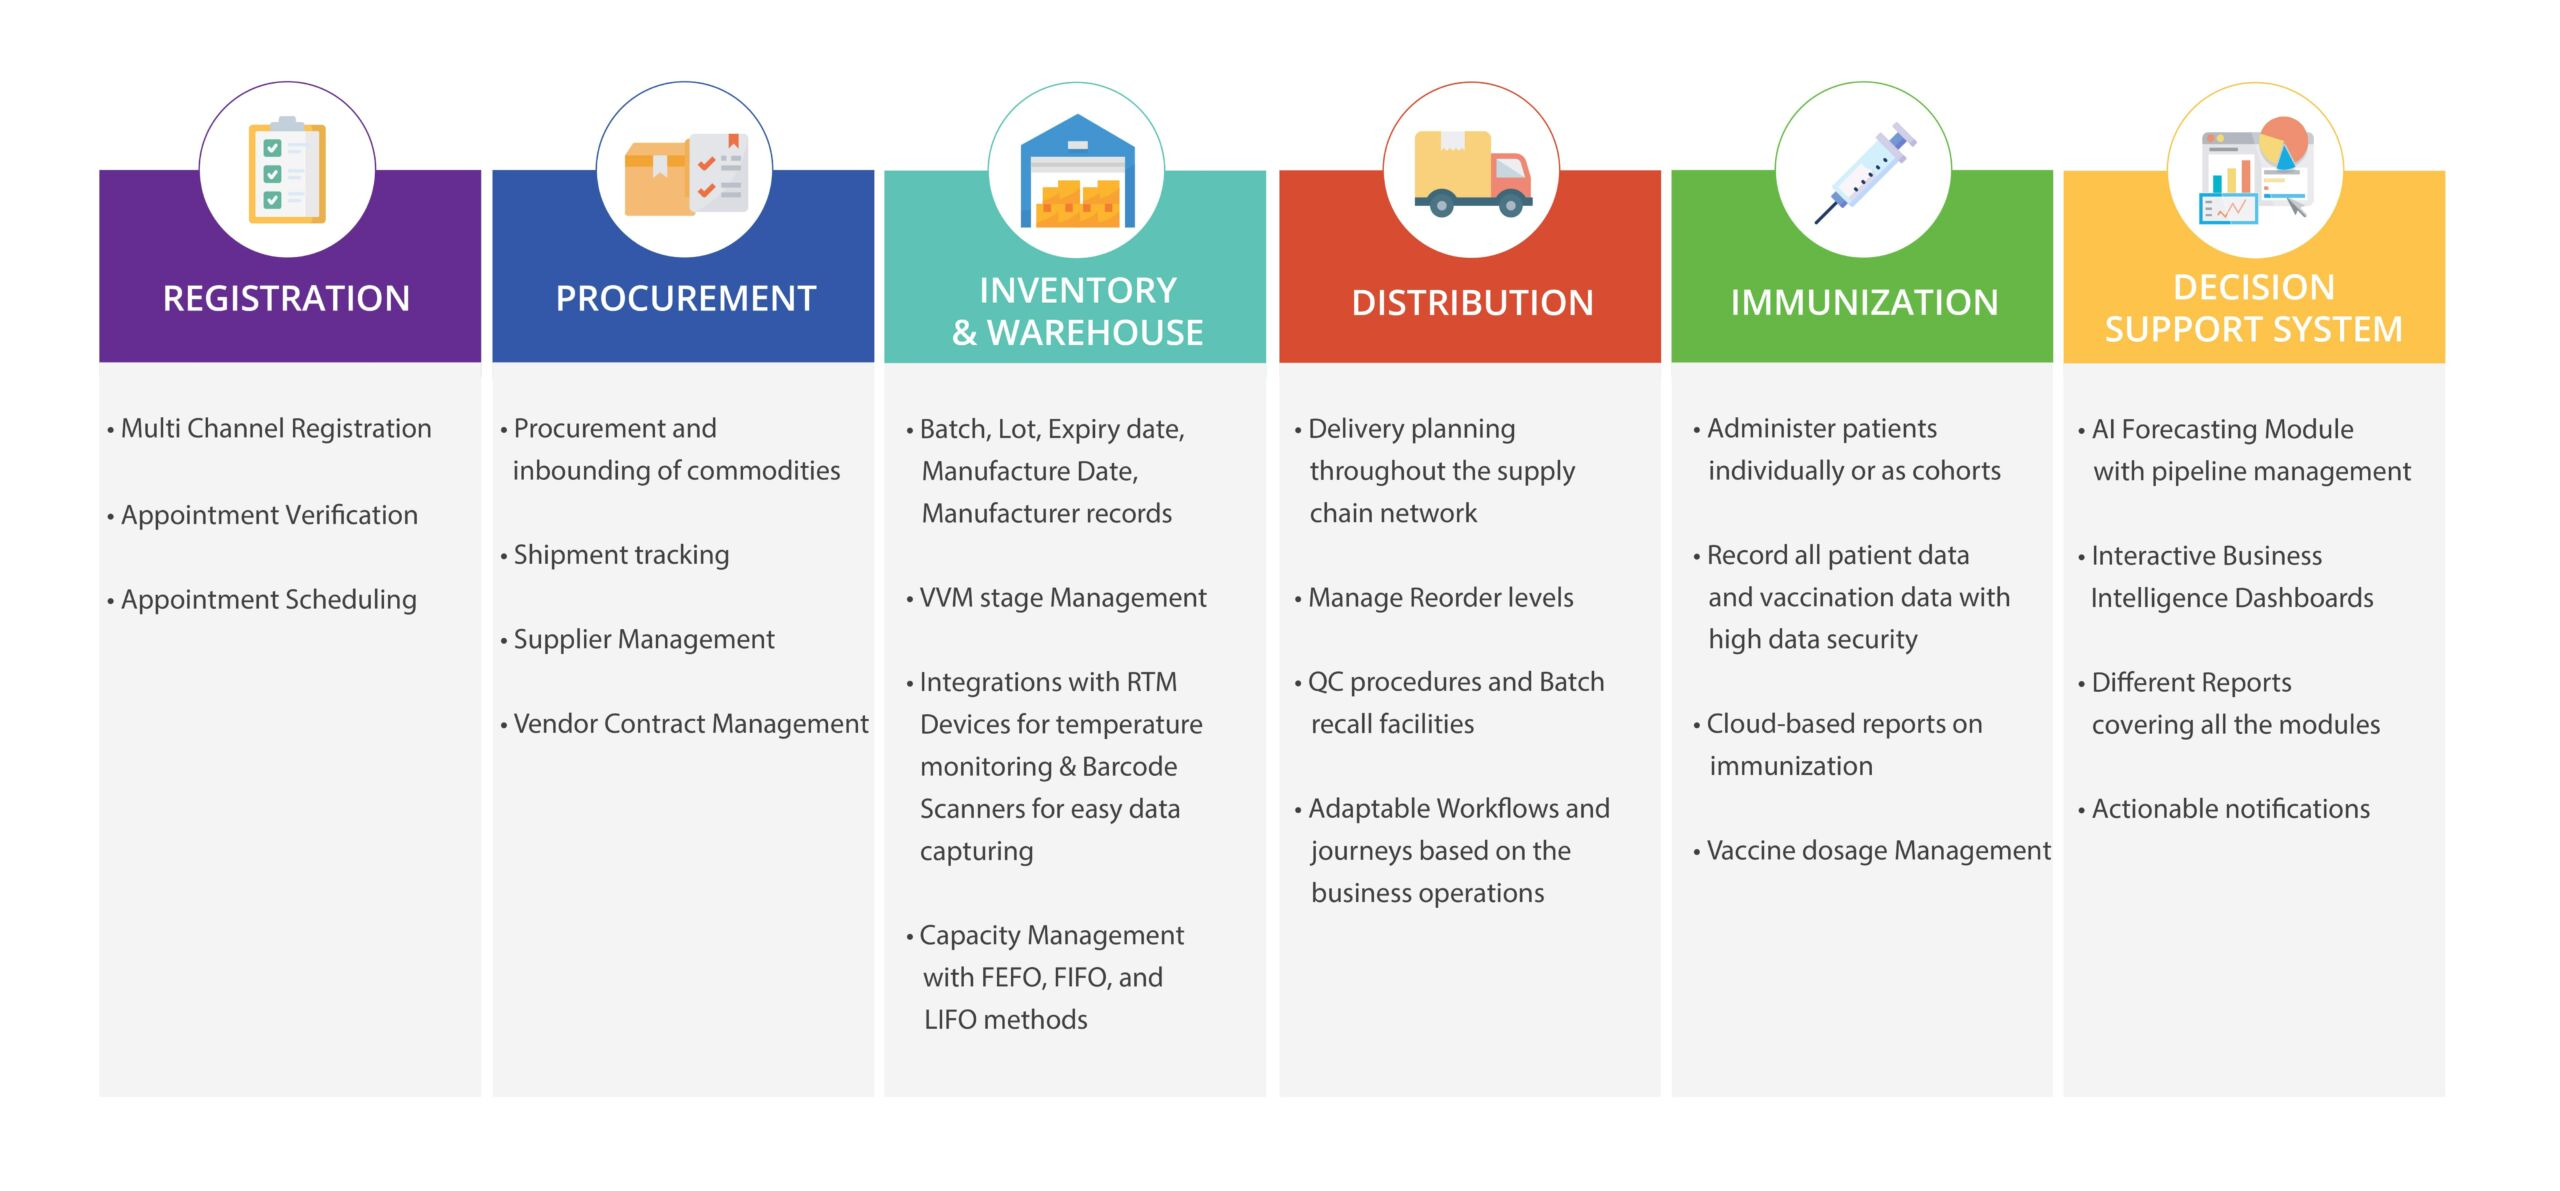 Features of Vaccine information management system and Logistics Management - Entution Vesta